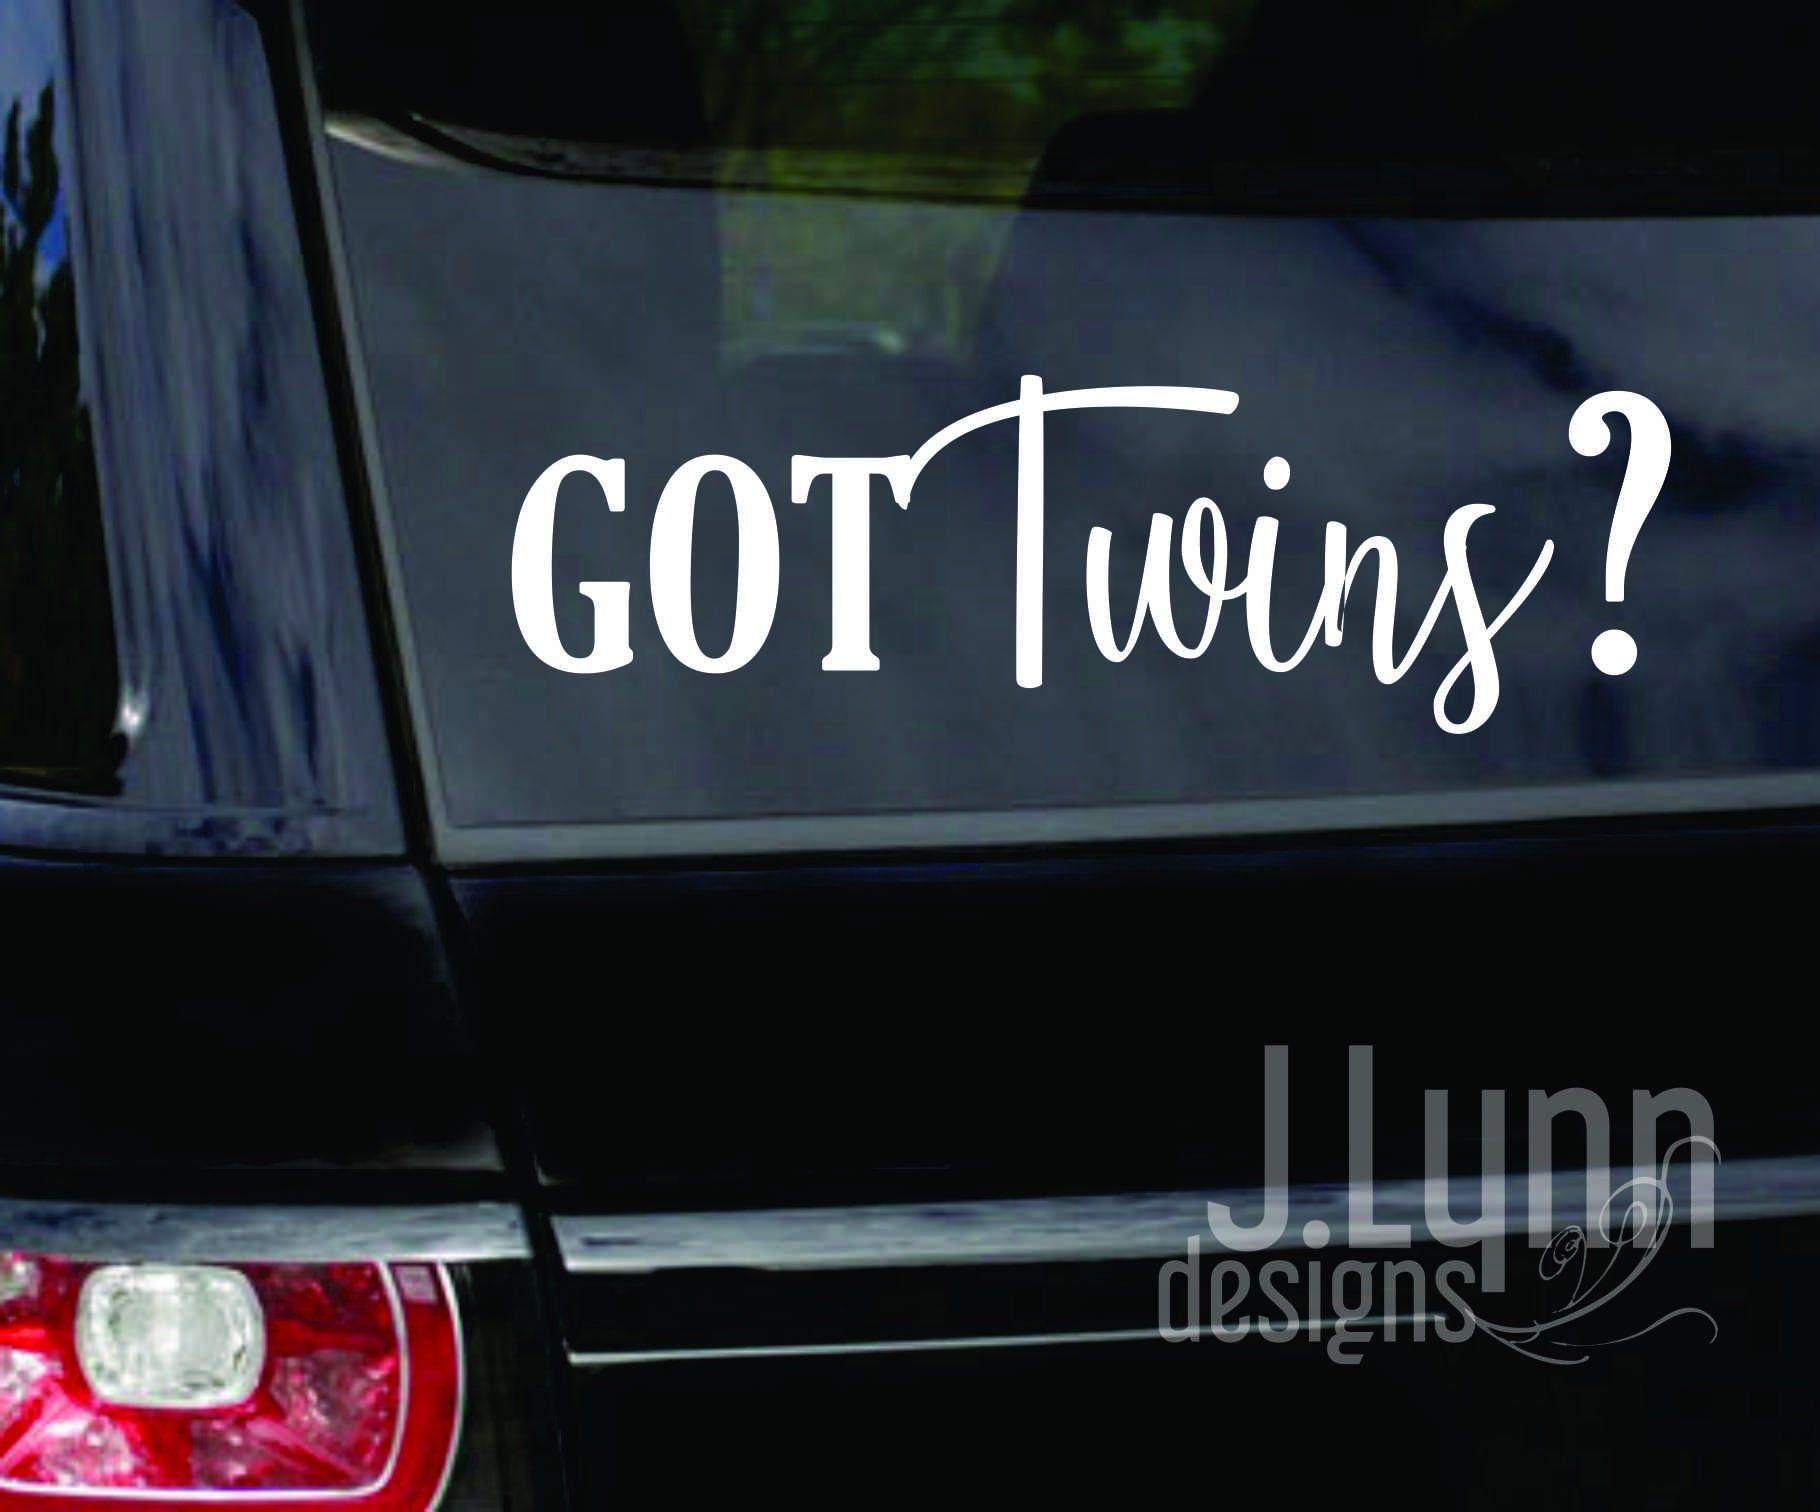 Got Multiples Twins Triplets Quads Car Decals Window Graphic Babies Vinyl Sticker Family Decal Twin Sticker Triplet St Family Decals Baby Decals Kids Decals [ 1512 x 1820 Pixel ]